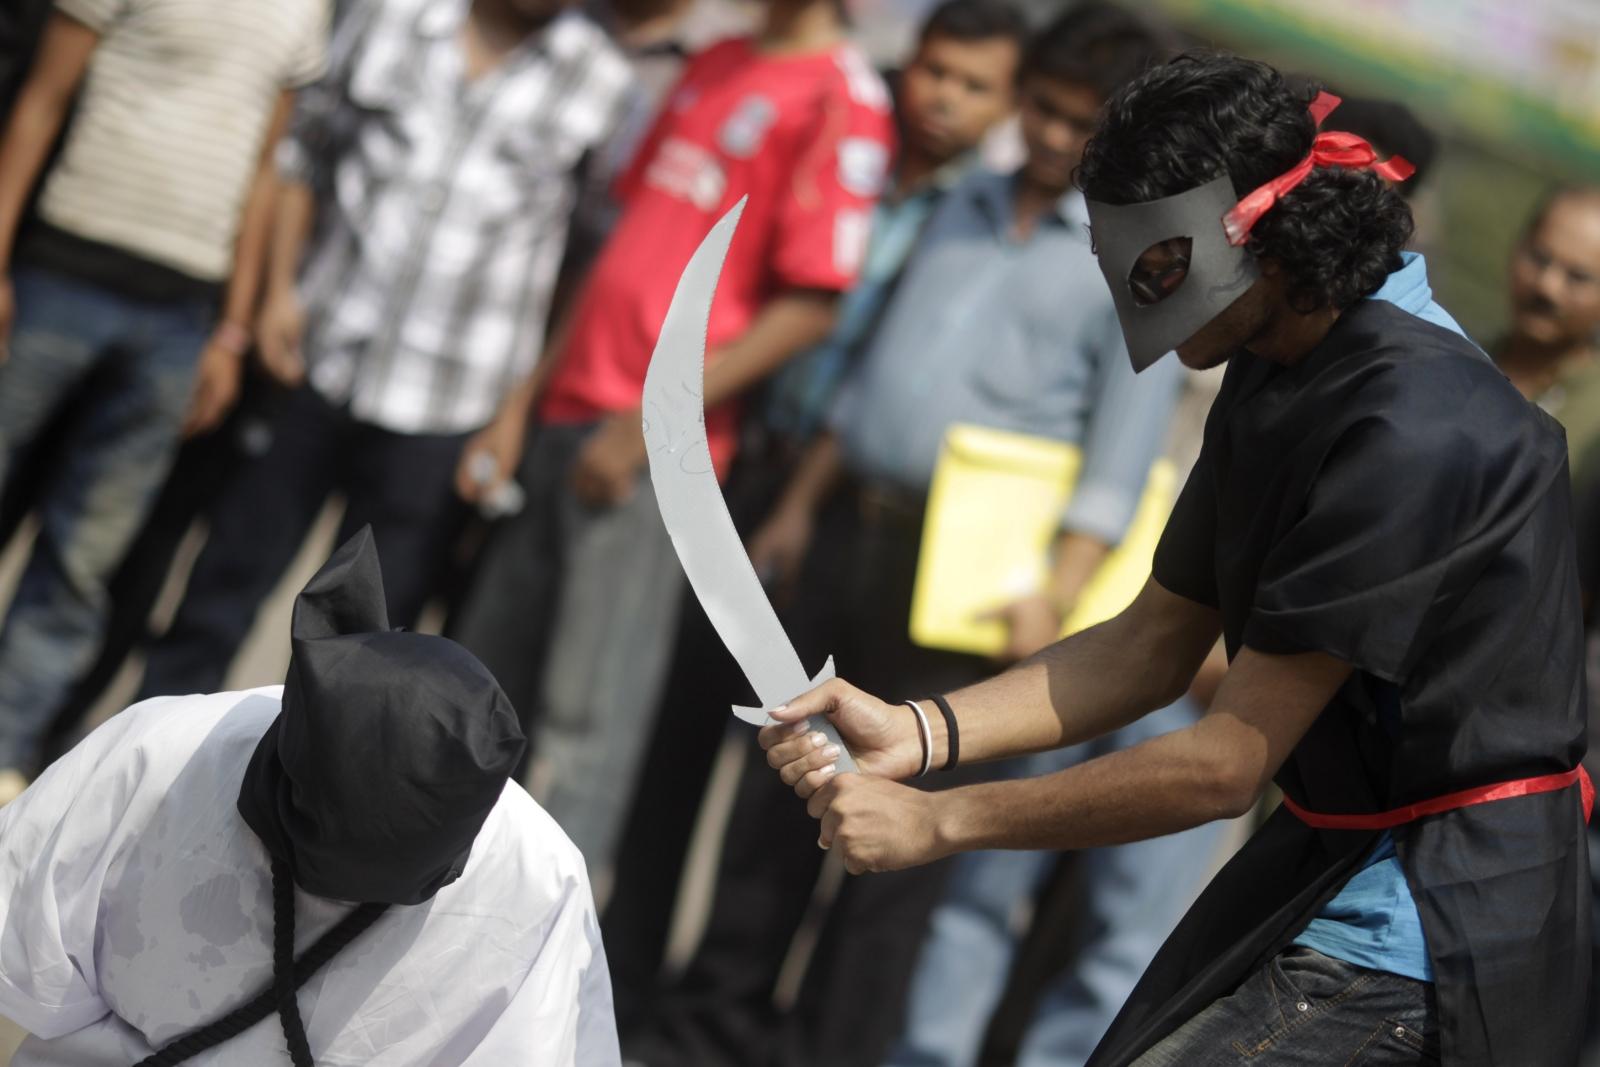 Saudi Arabia execution